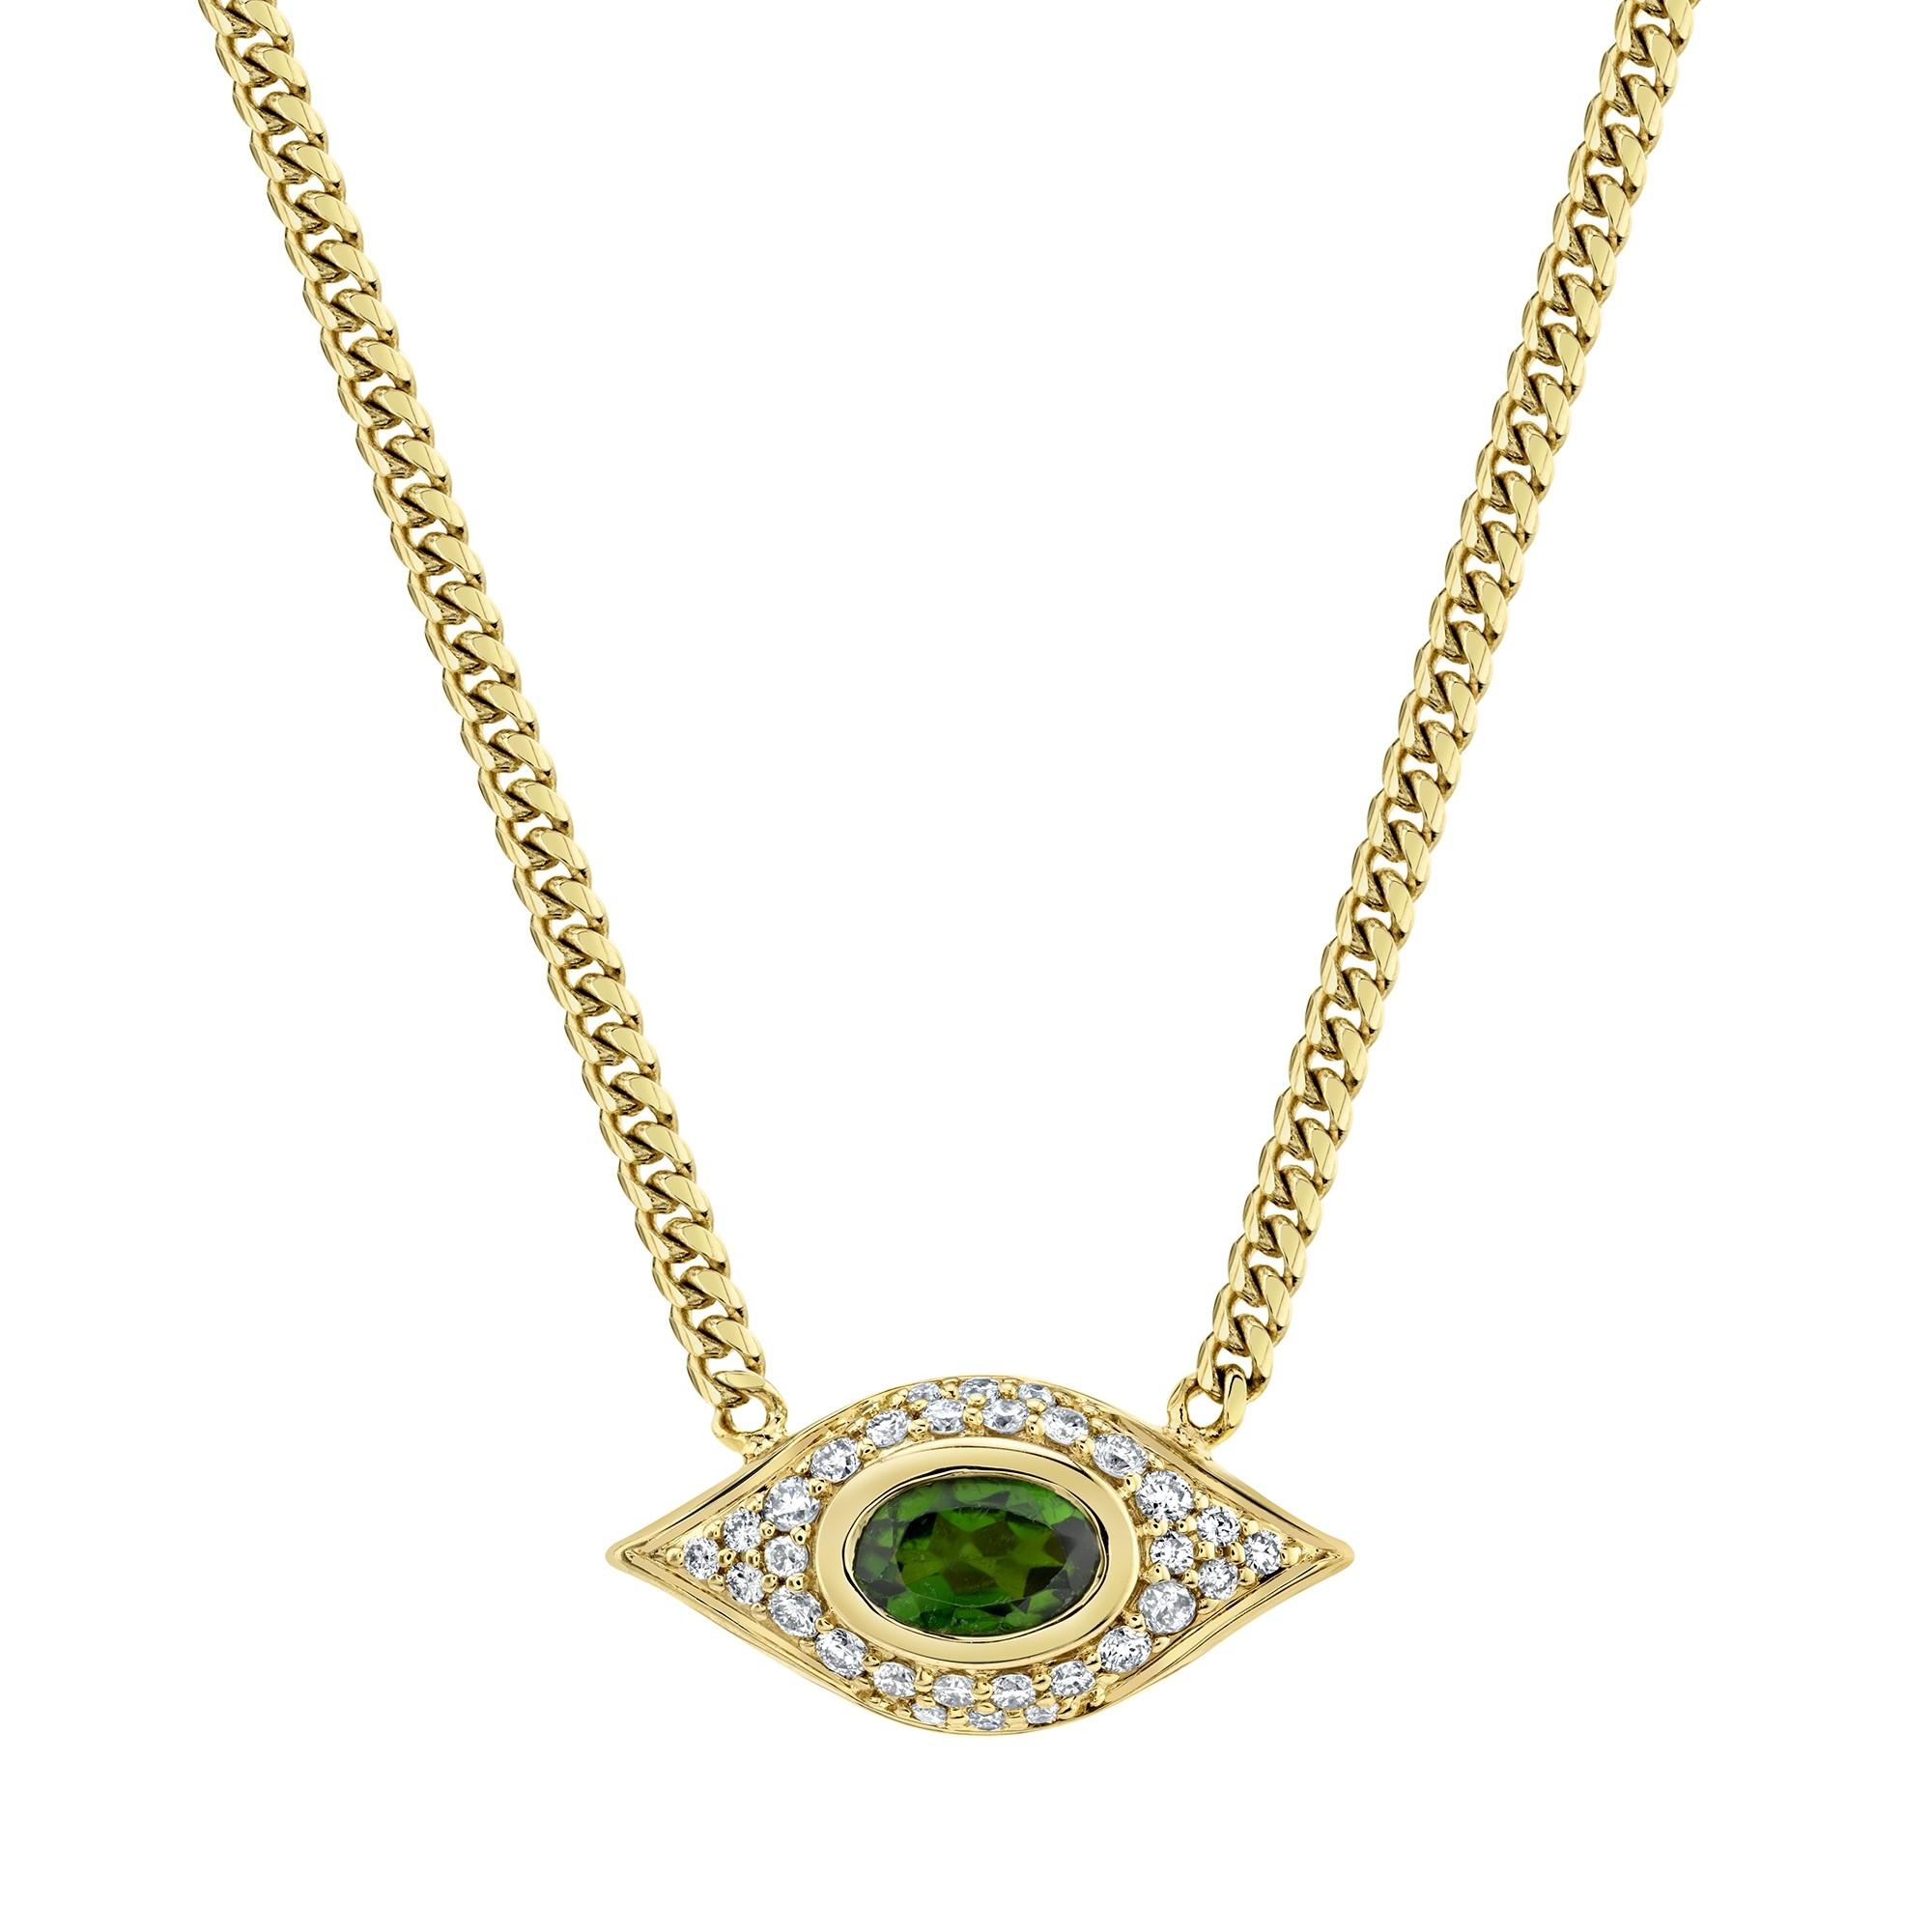 14k Yellow Gold Diamond Oval Green Tourmaline Evil Eye Necklace